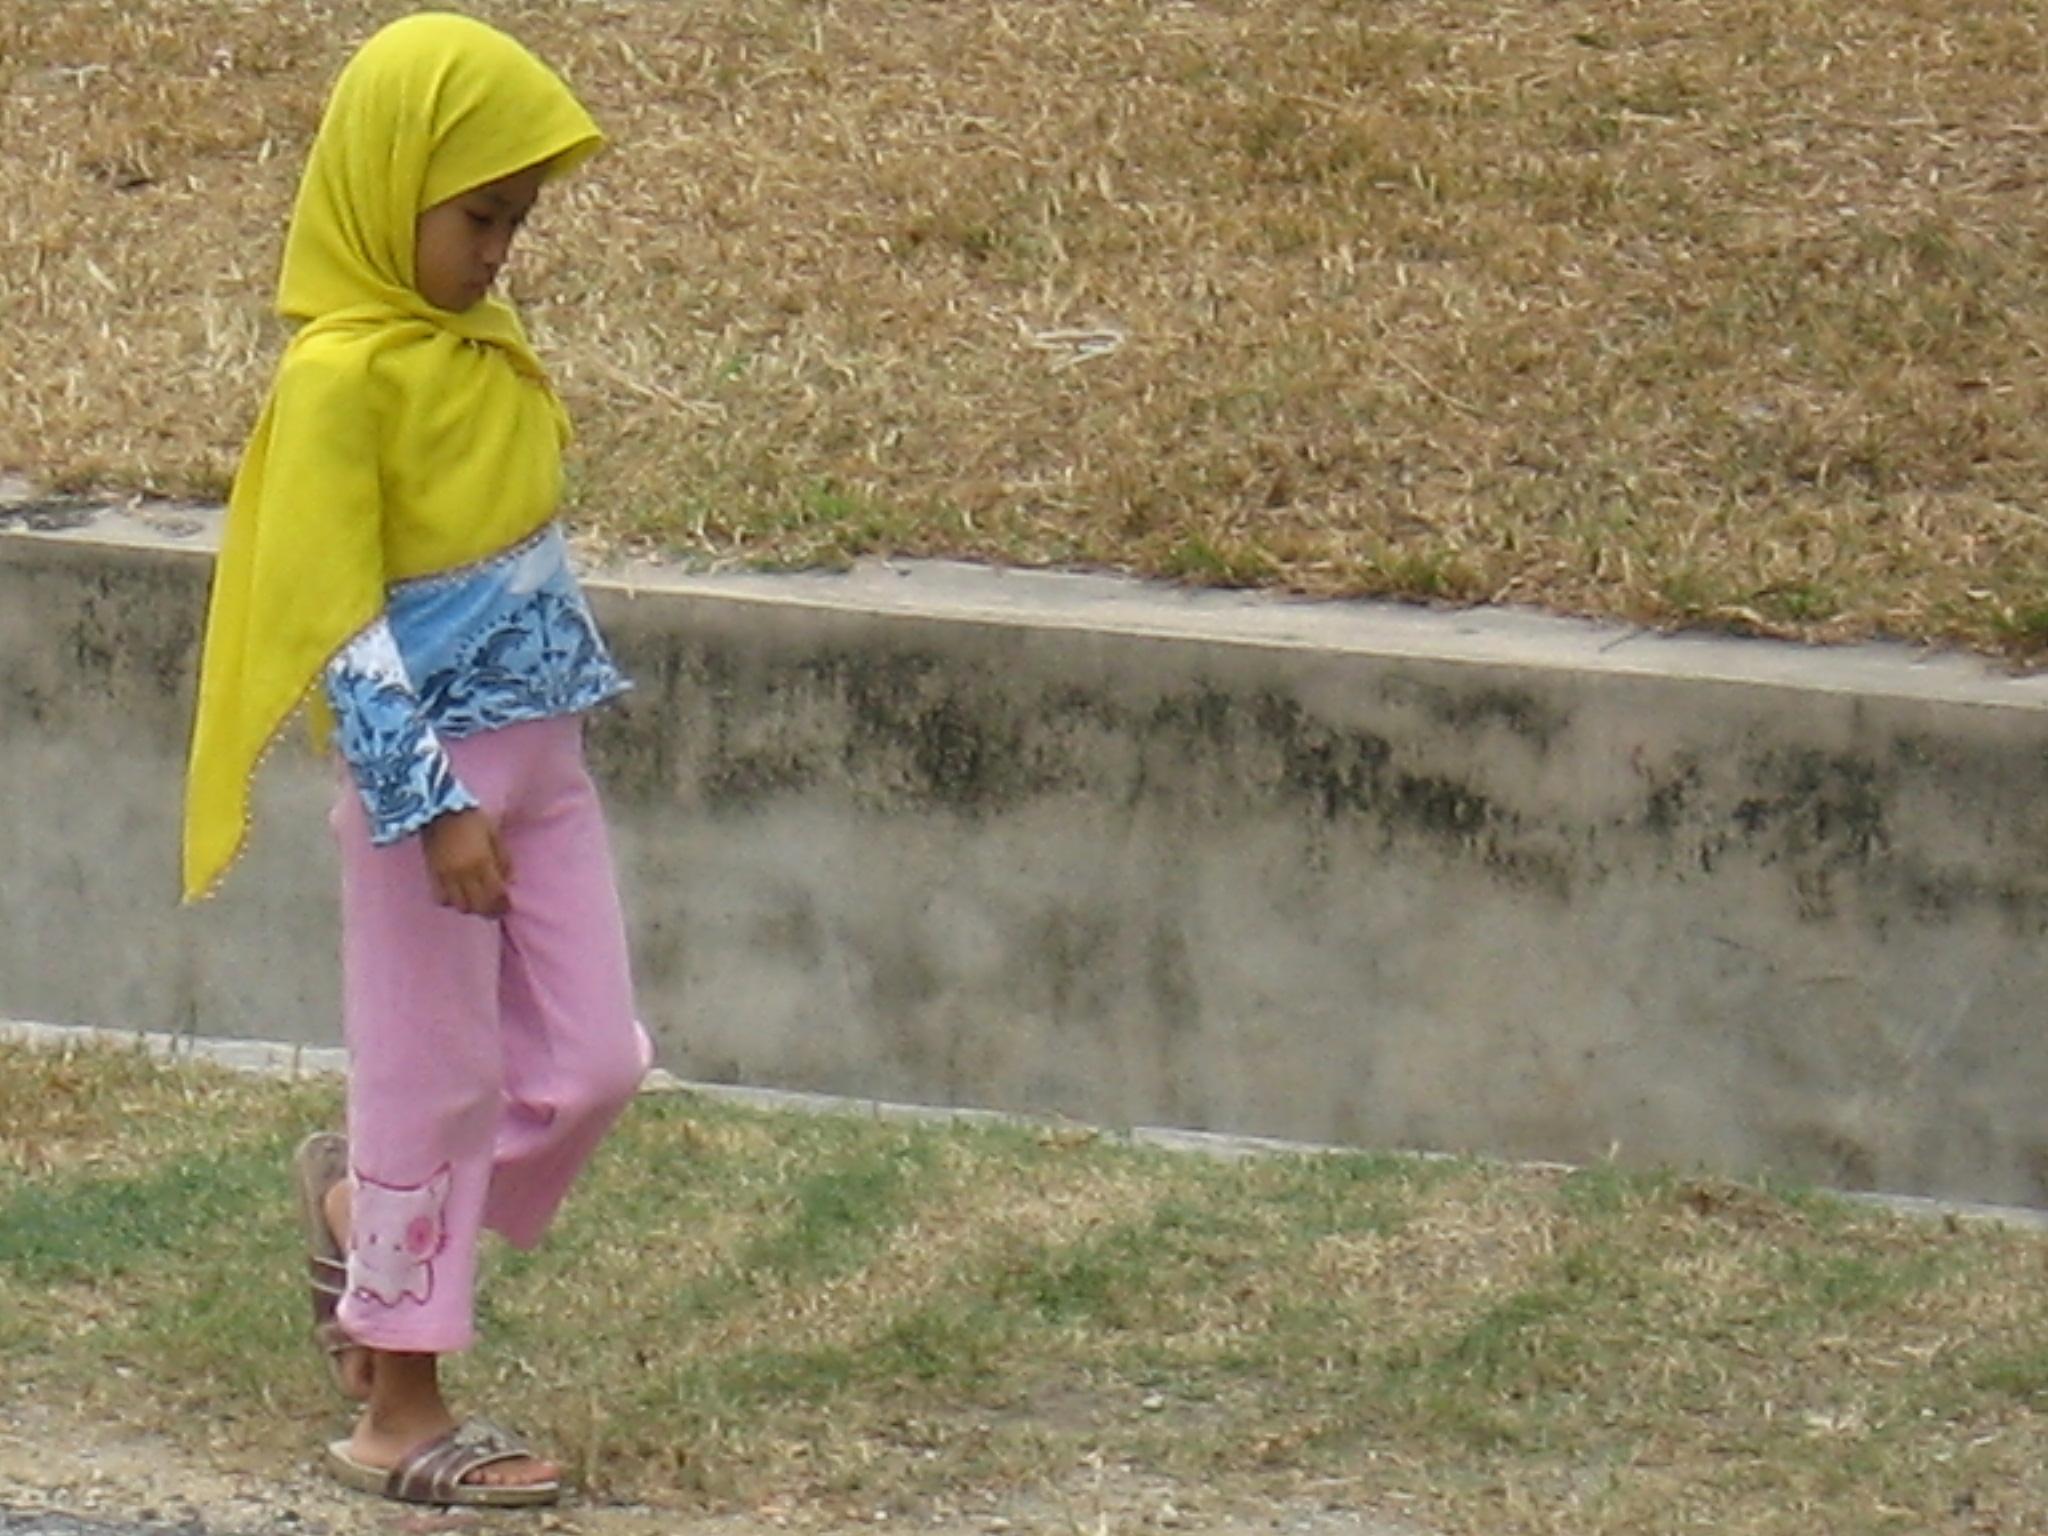 https://i2.wp.com/upload.wikimedia.org/wikipedia/commons/8/89/Malay_little_girl.jpg